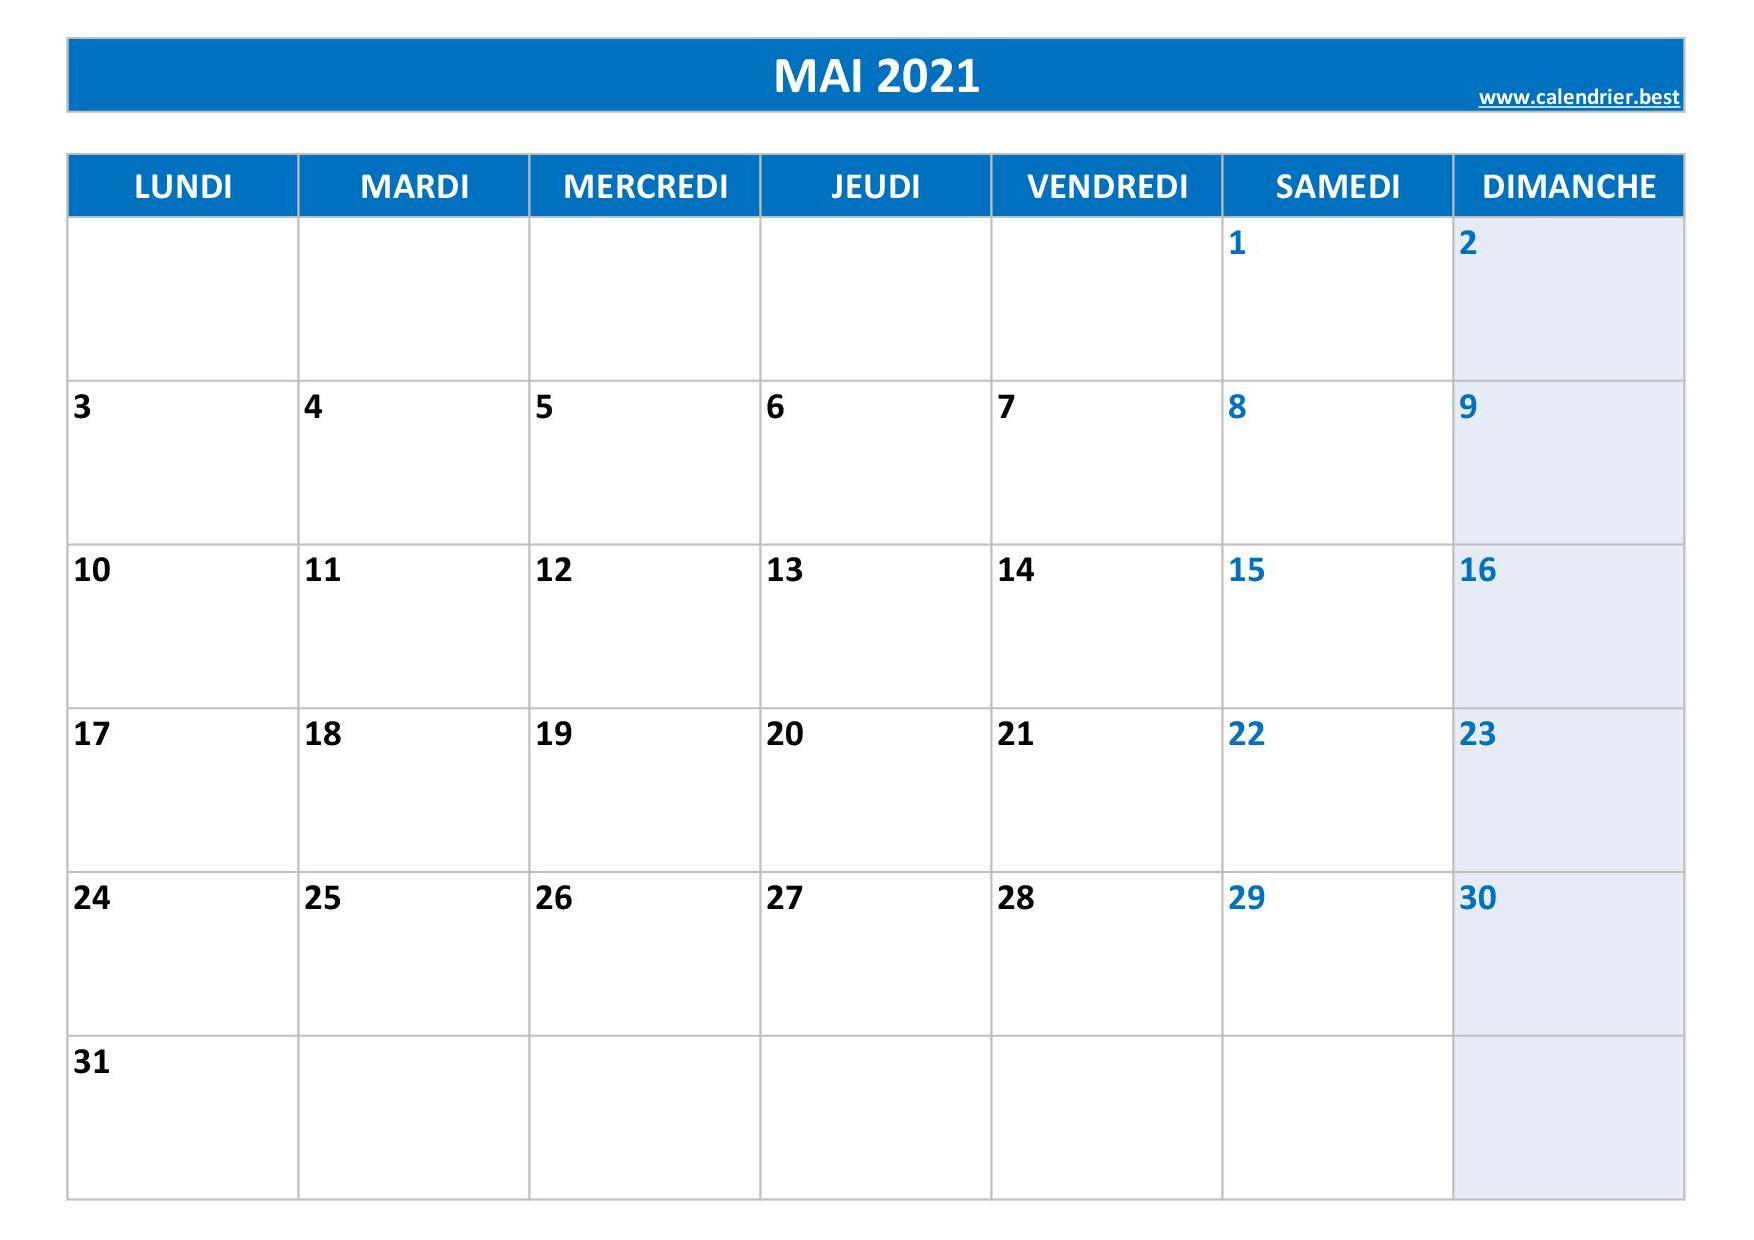 Calendrier 2021 Mois De Mai Calendrier Mai 2021 à consulter ou imprimer  Calendrier.best